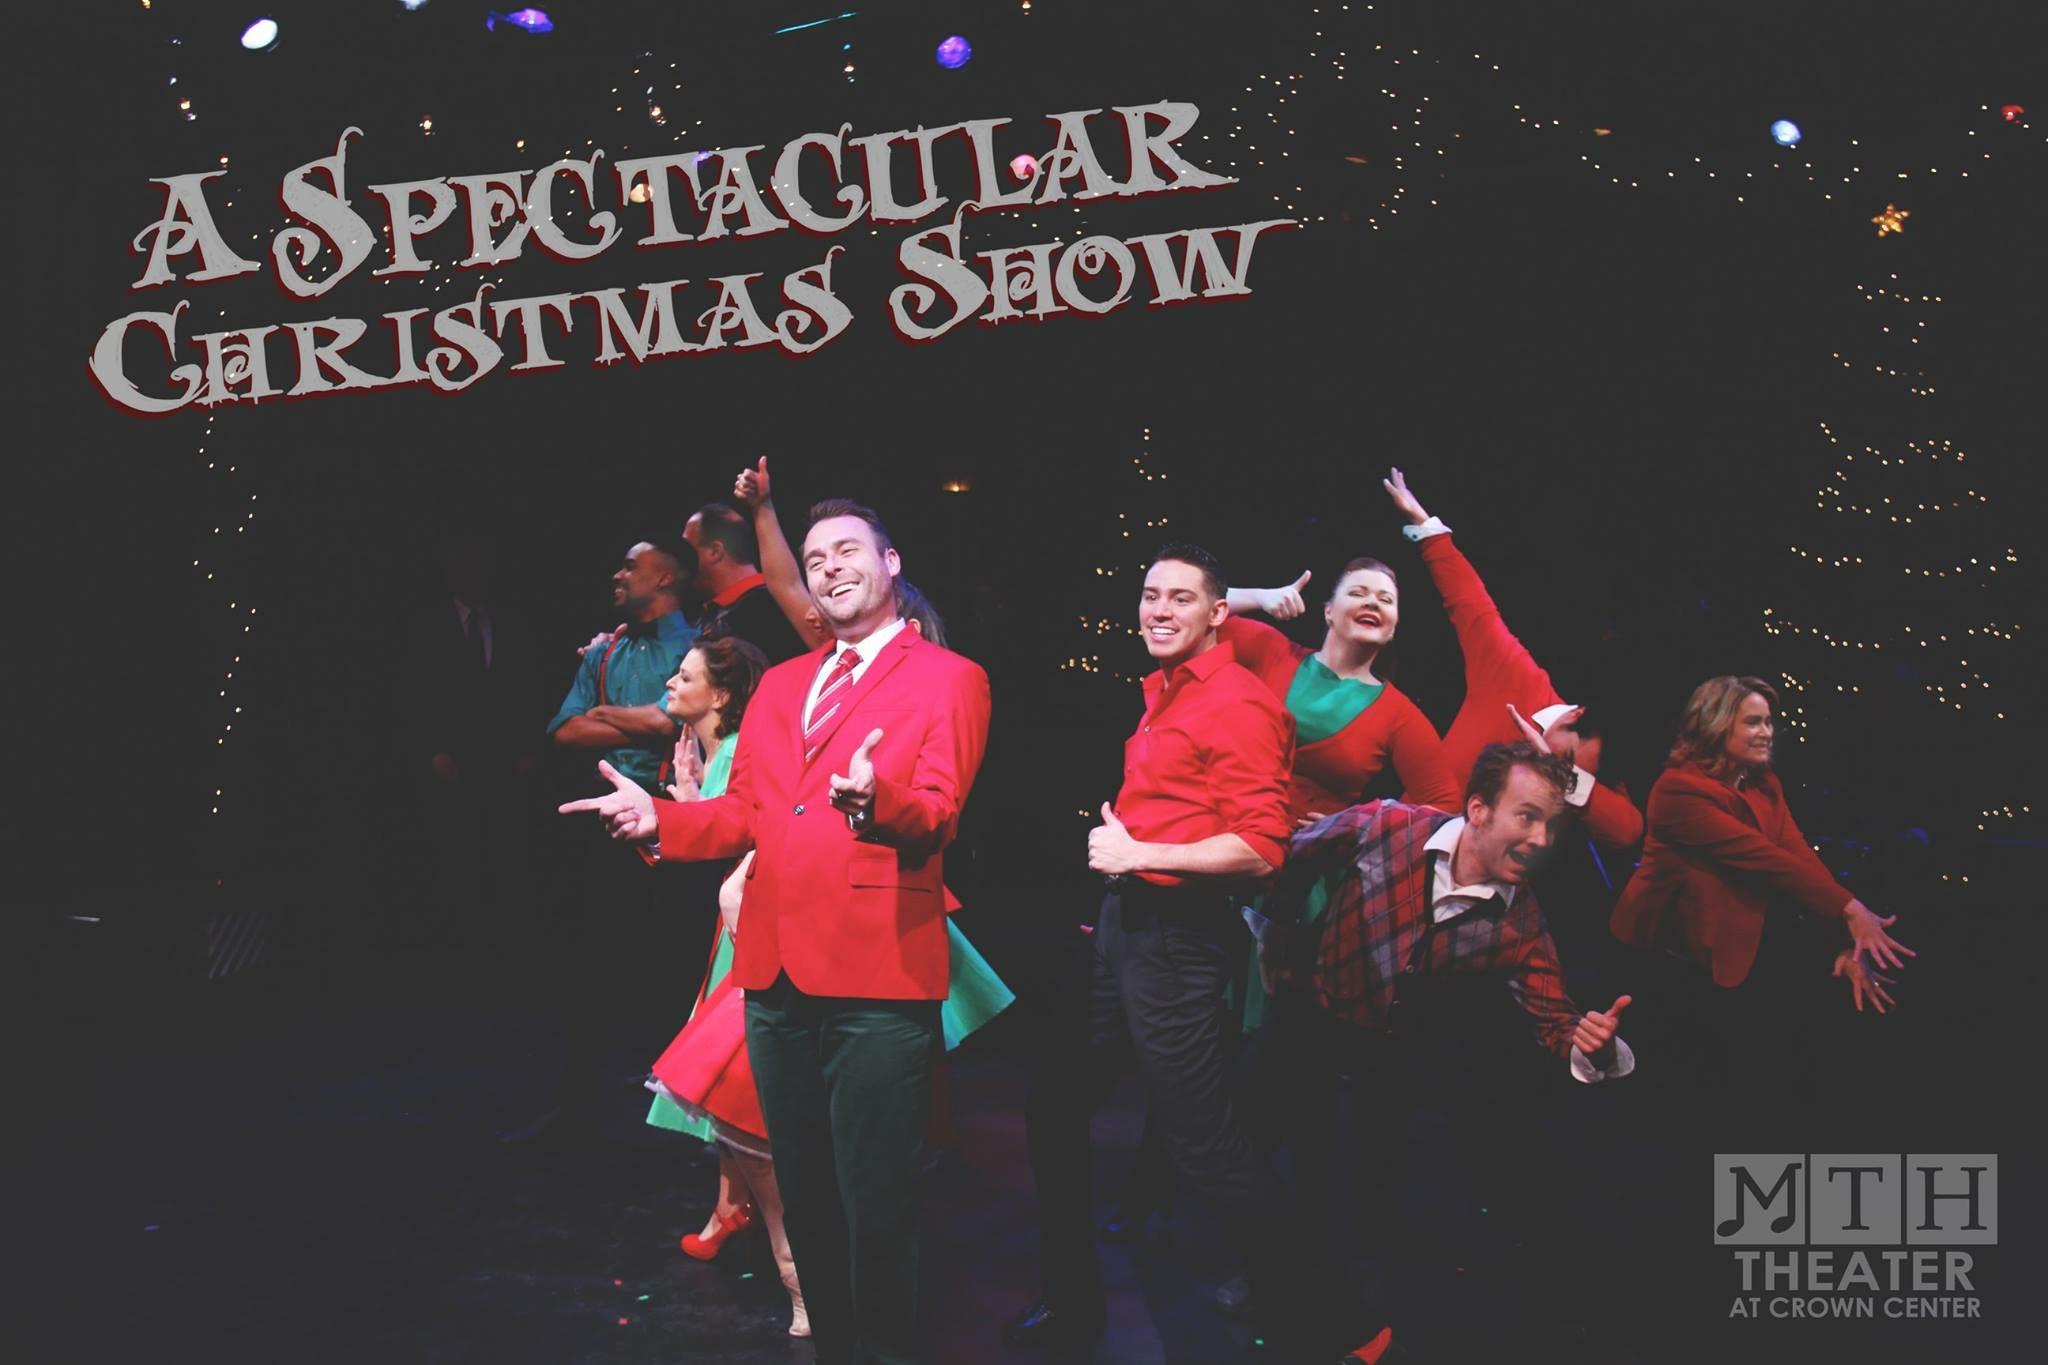 A Spectacular Christmas Show 2016